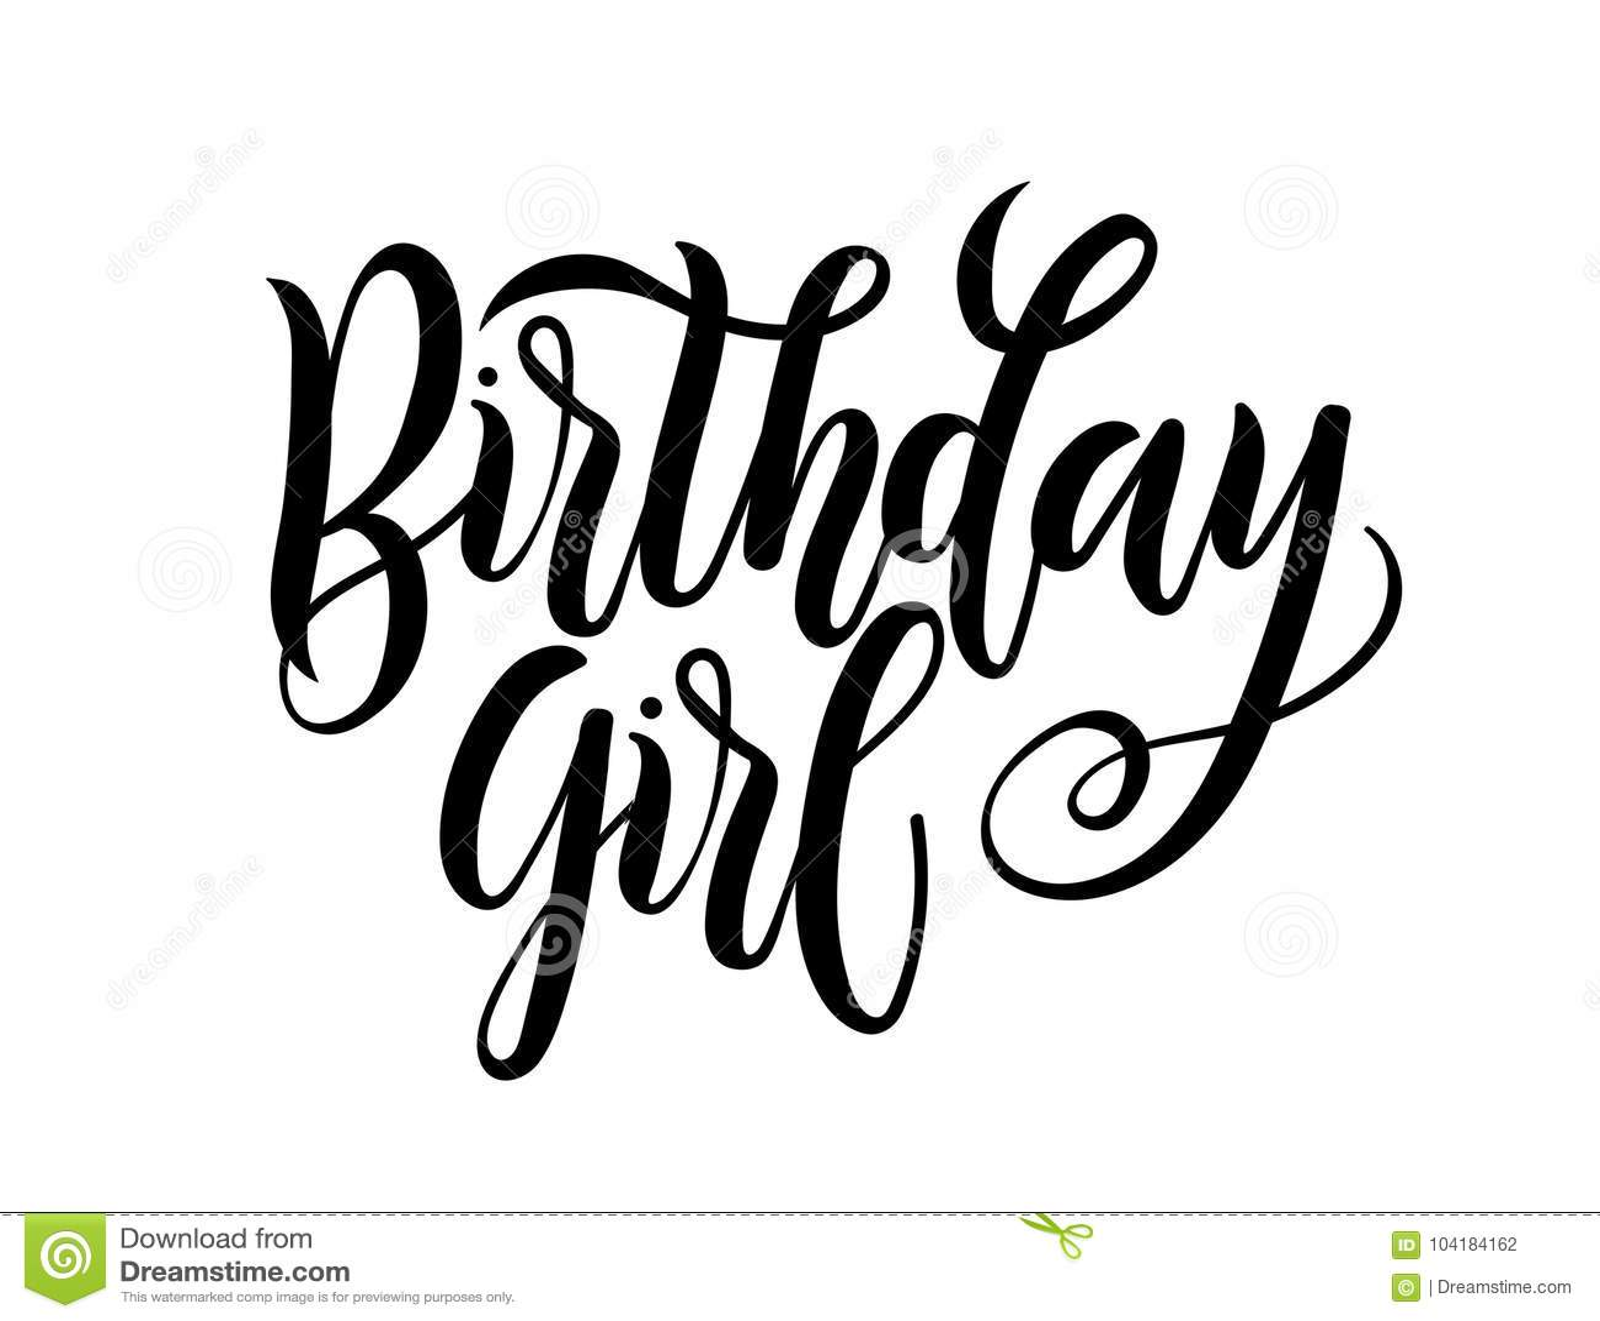 Birthday Girl Lettering Greeting Card Sign Design For